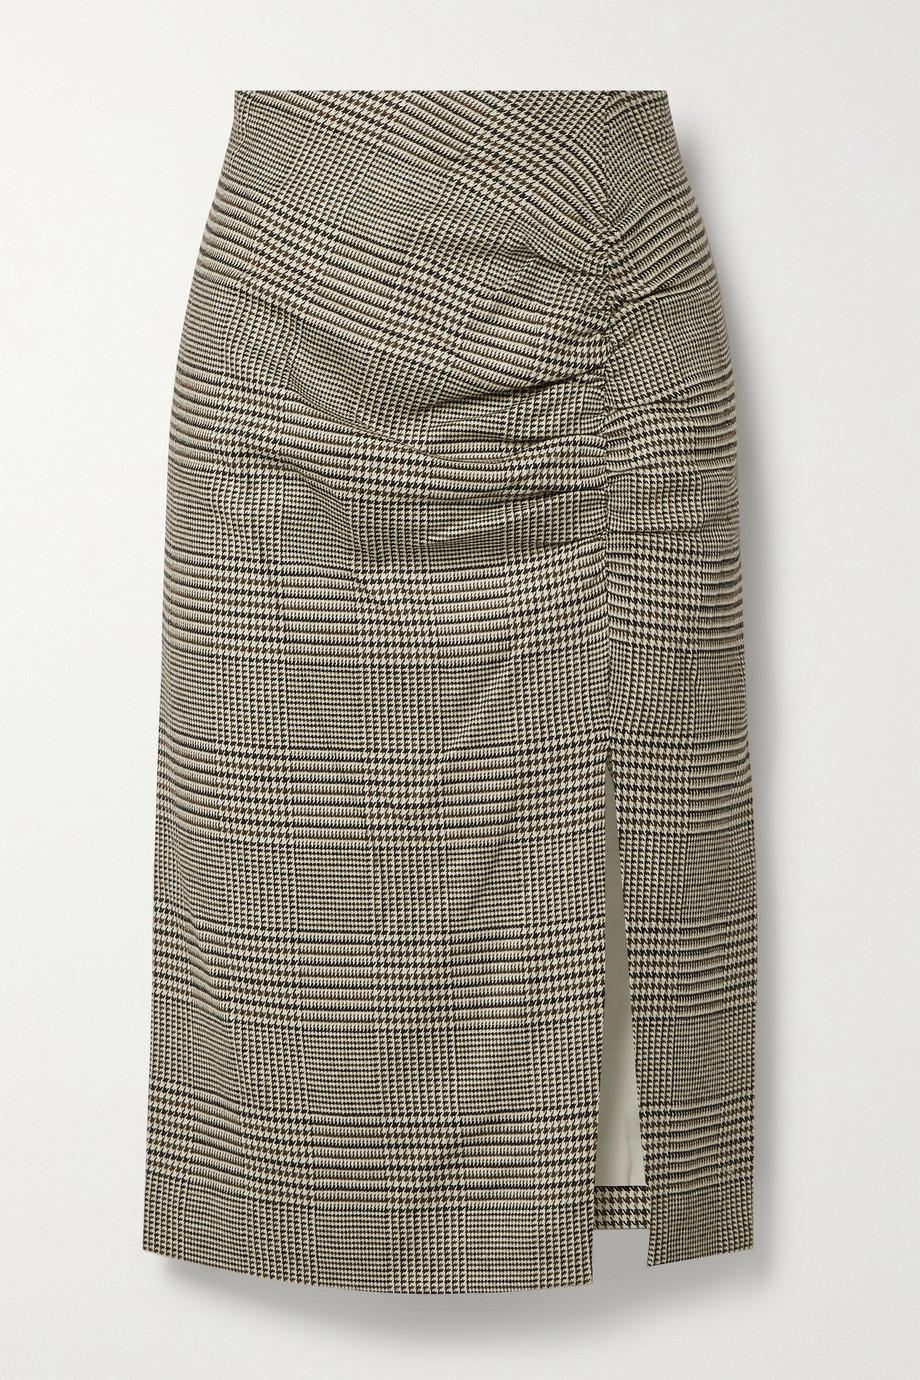 Veronica Beard Tamic ruched checked woven midi skirt